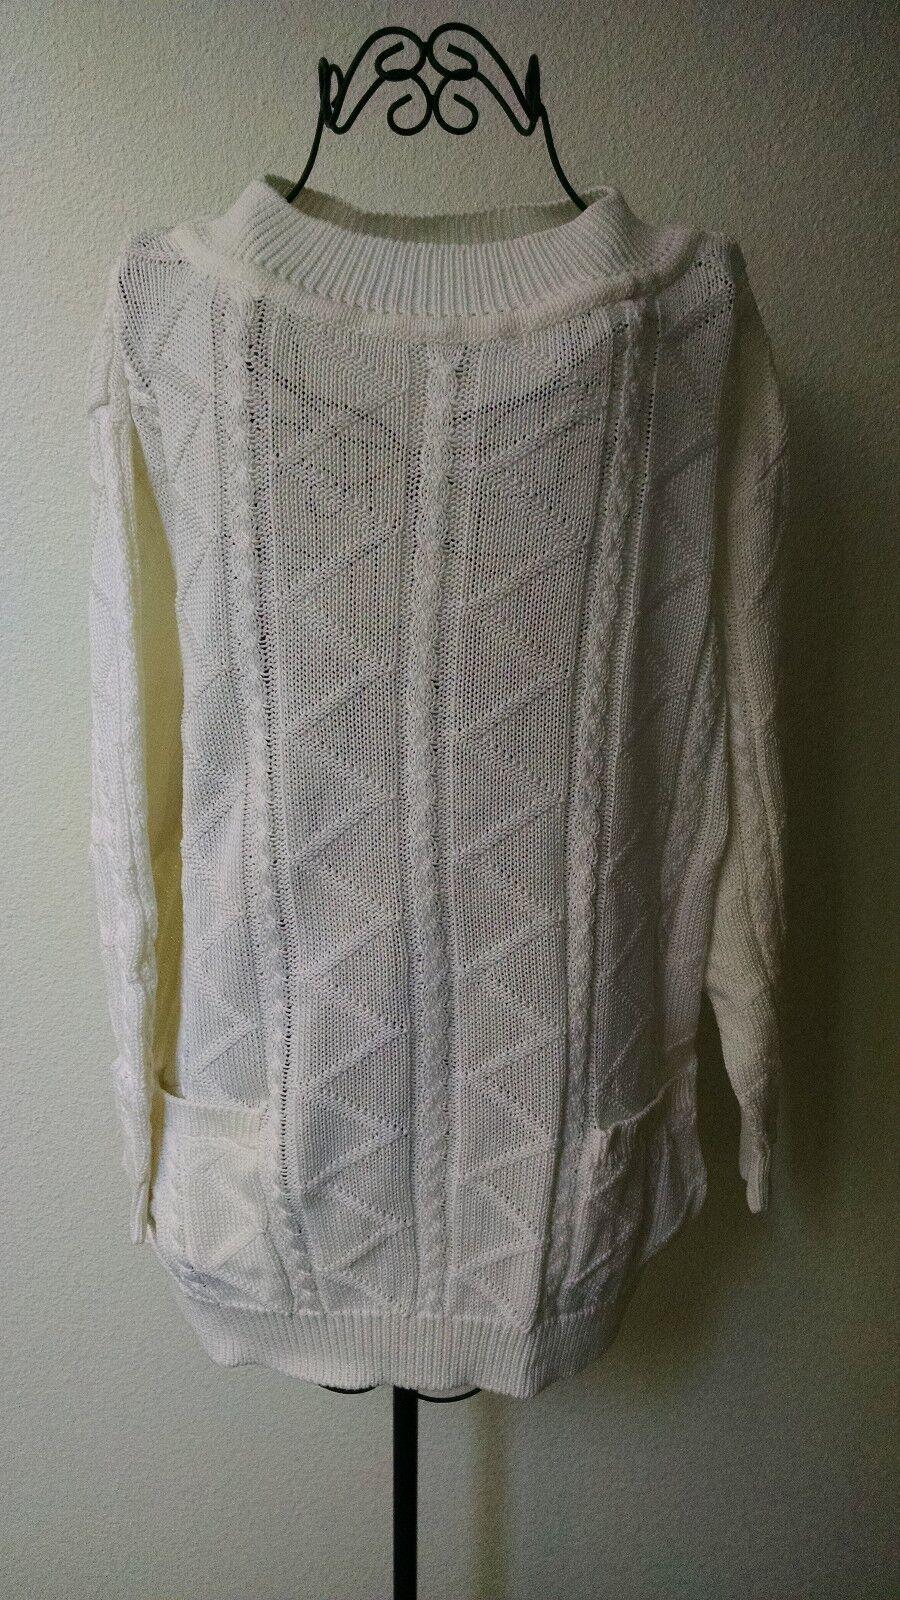 Adrienne Vittadini White Cotton Sweater, Size M, Item